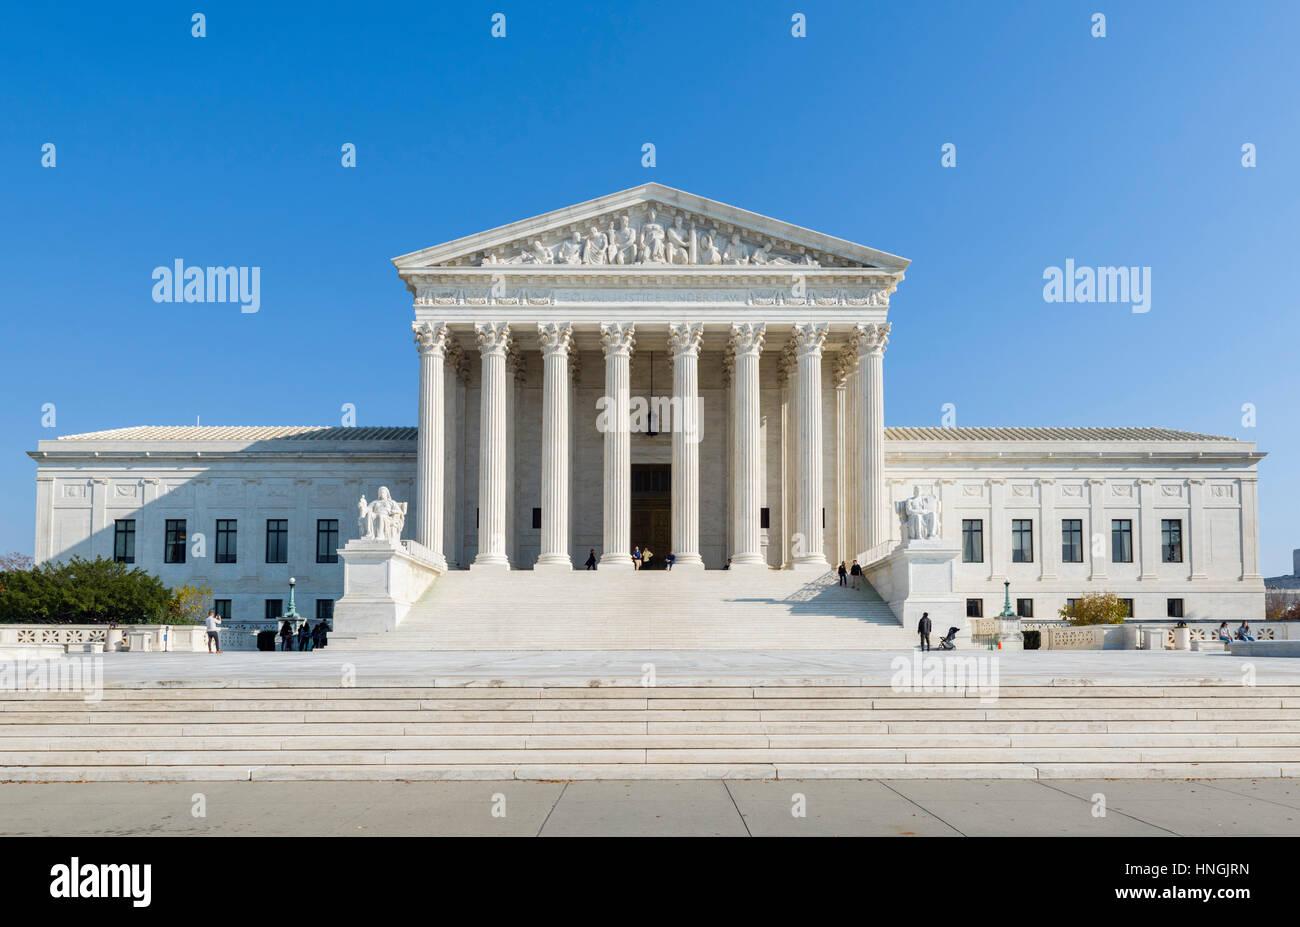 United States Supreme Court Gebäude, 1st Street Northeast, Washington DC, USA Stockbild